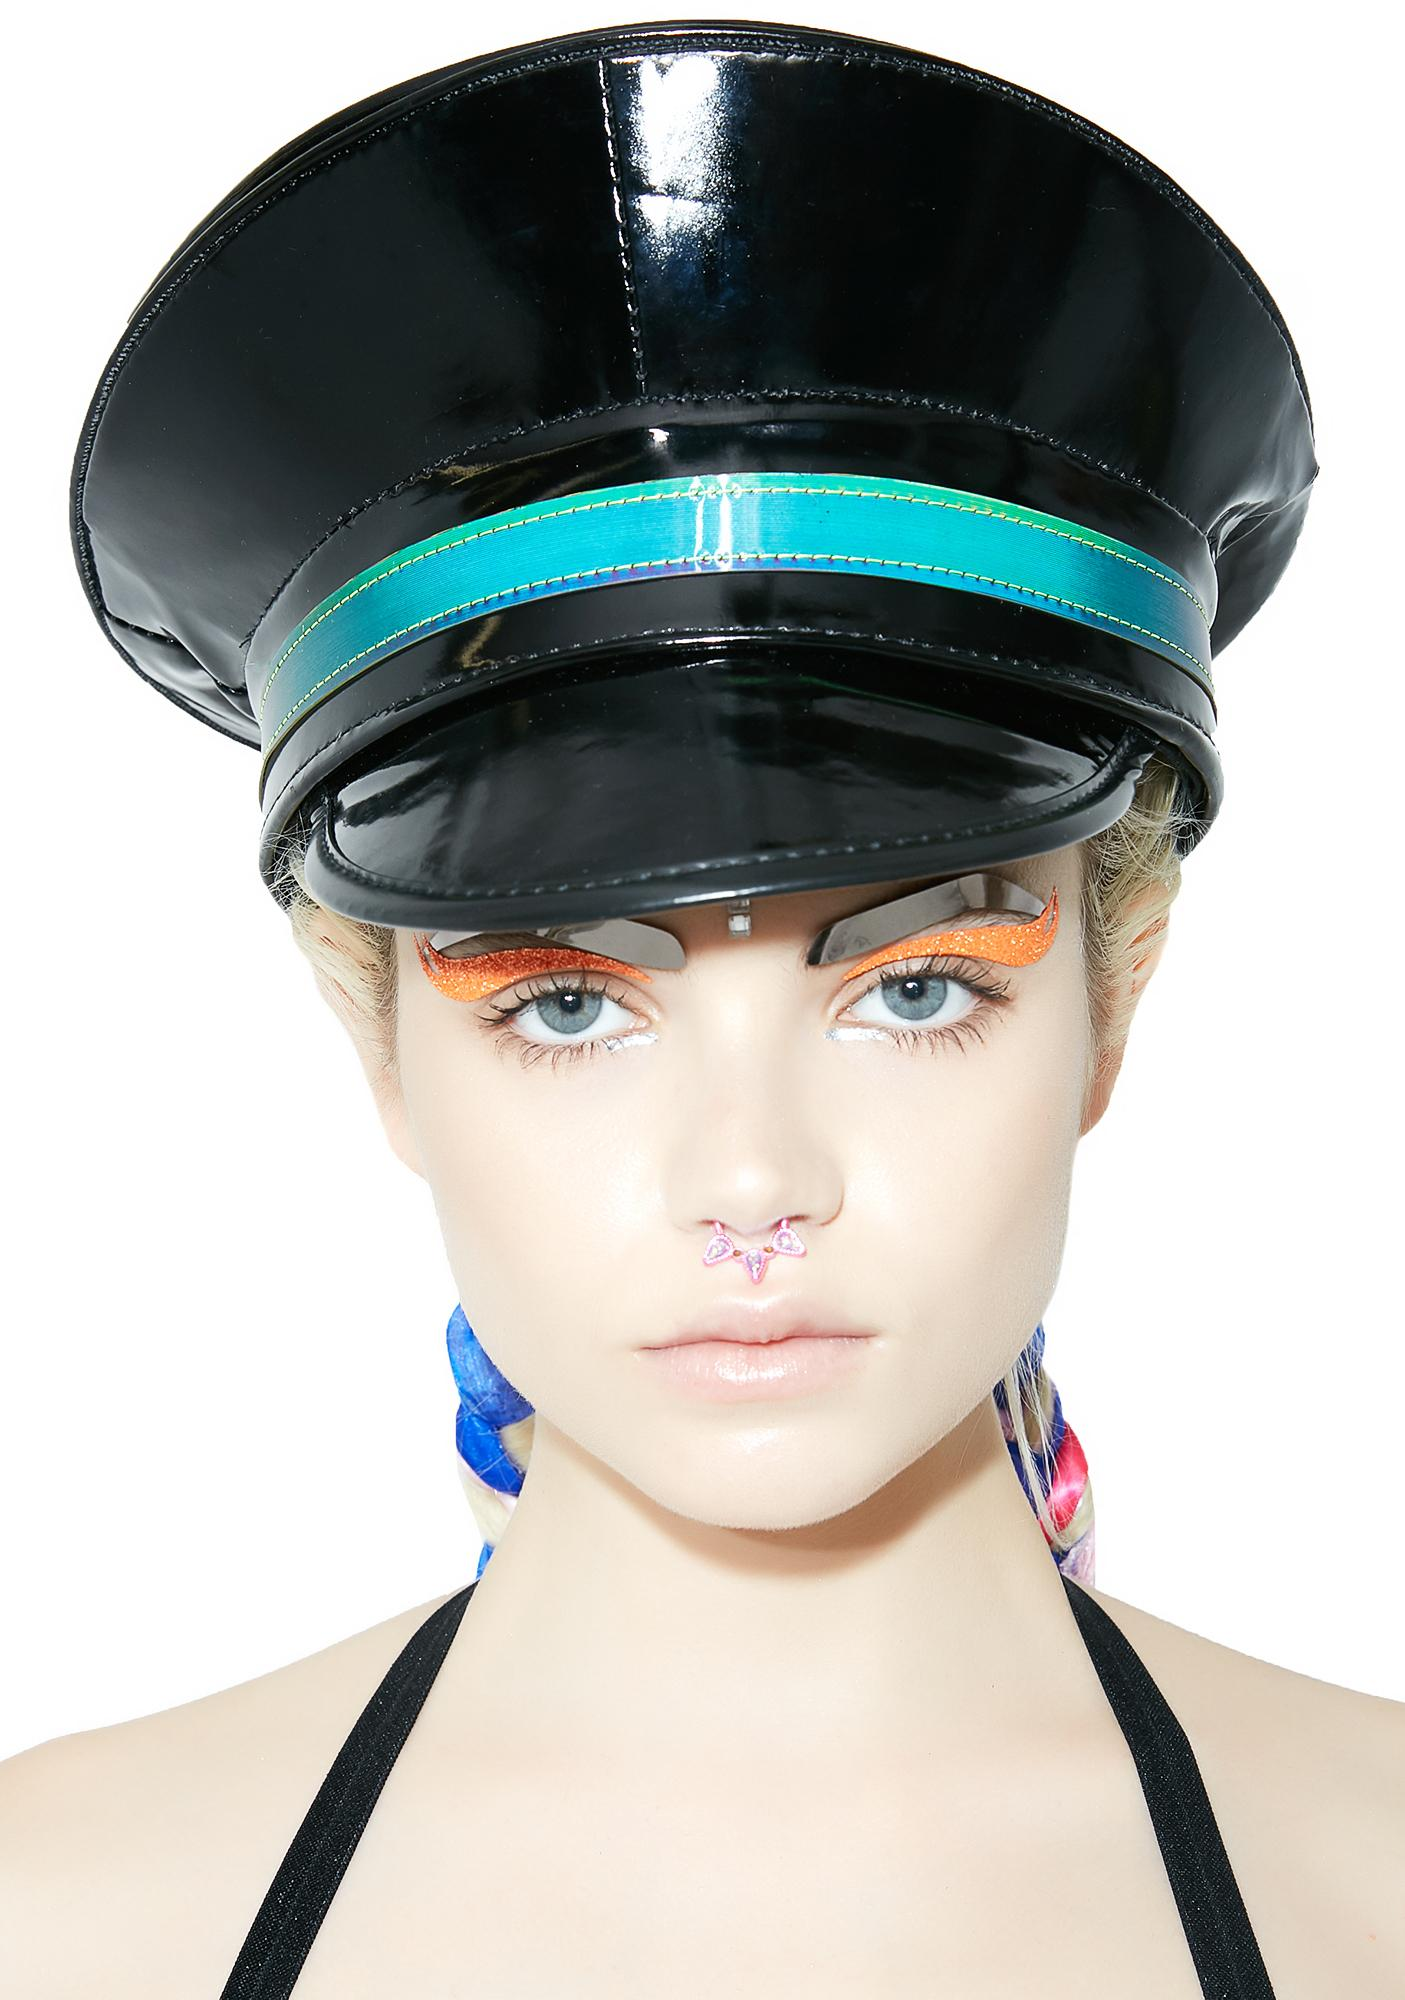 Head Trip Officer's Hat